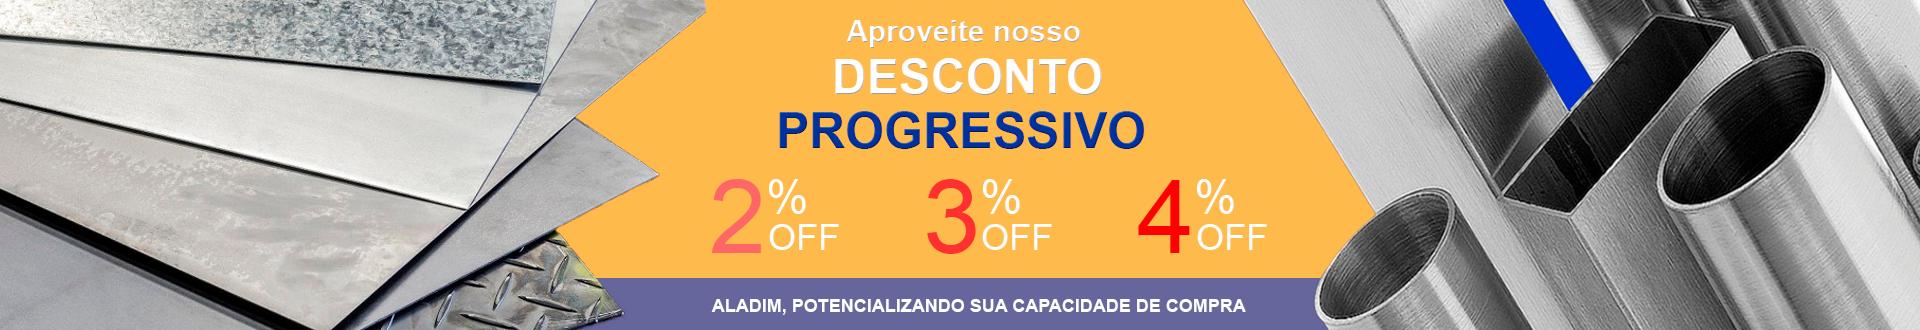 2019 02 11 banner 1920x330 fundo laranja - desconto progressivo - 2-3-4%